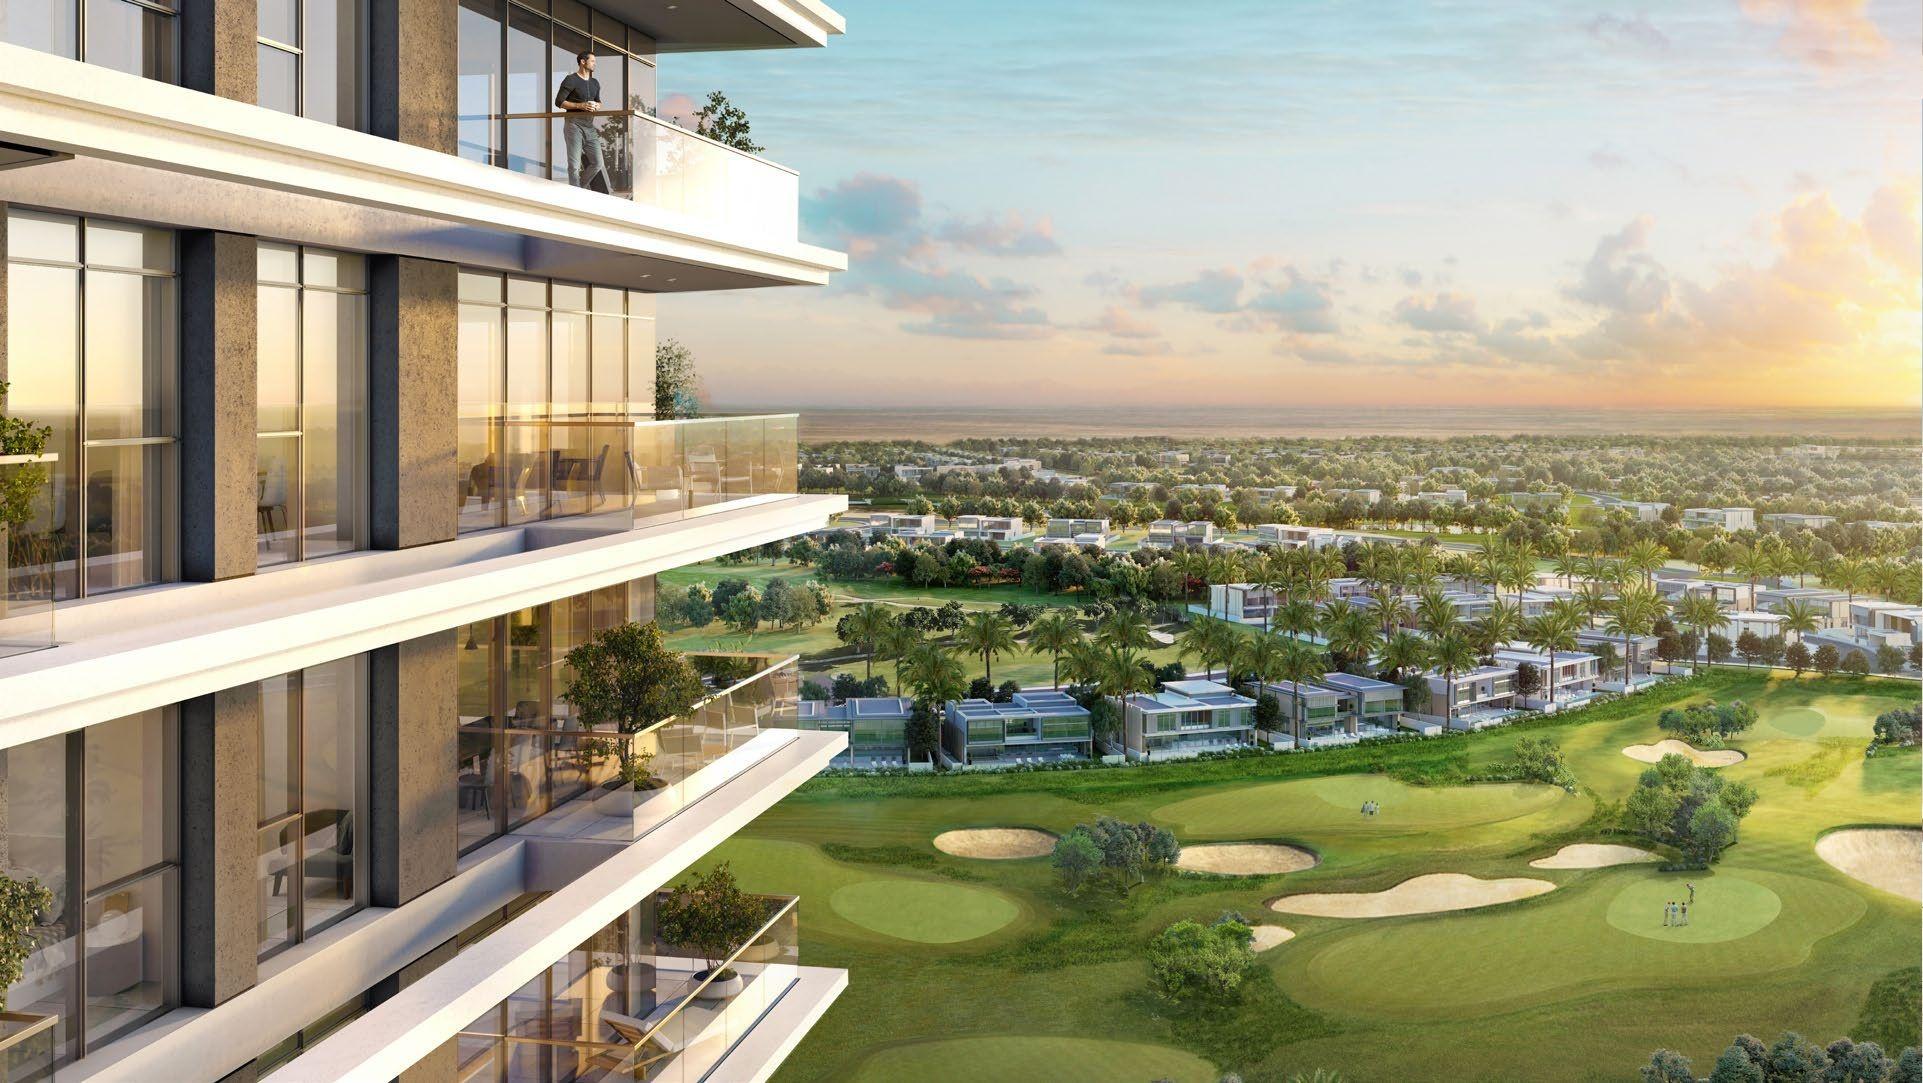 Golf Suites At Dubai Hills Estate By Emaar 1 2 3